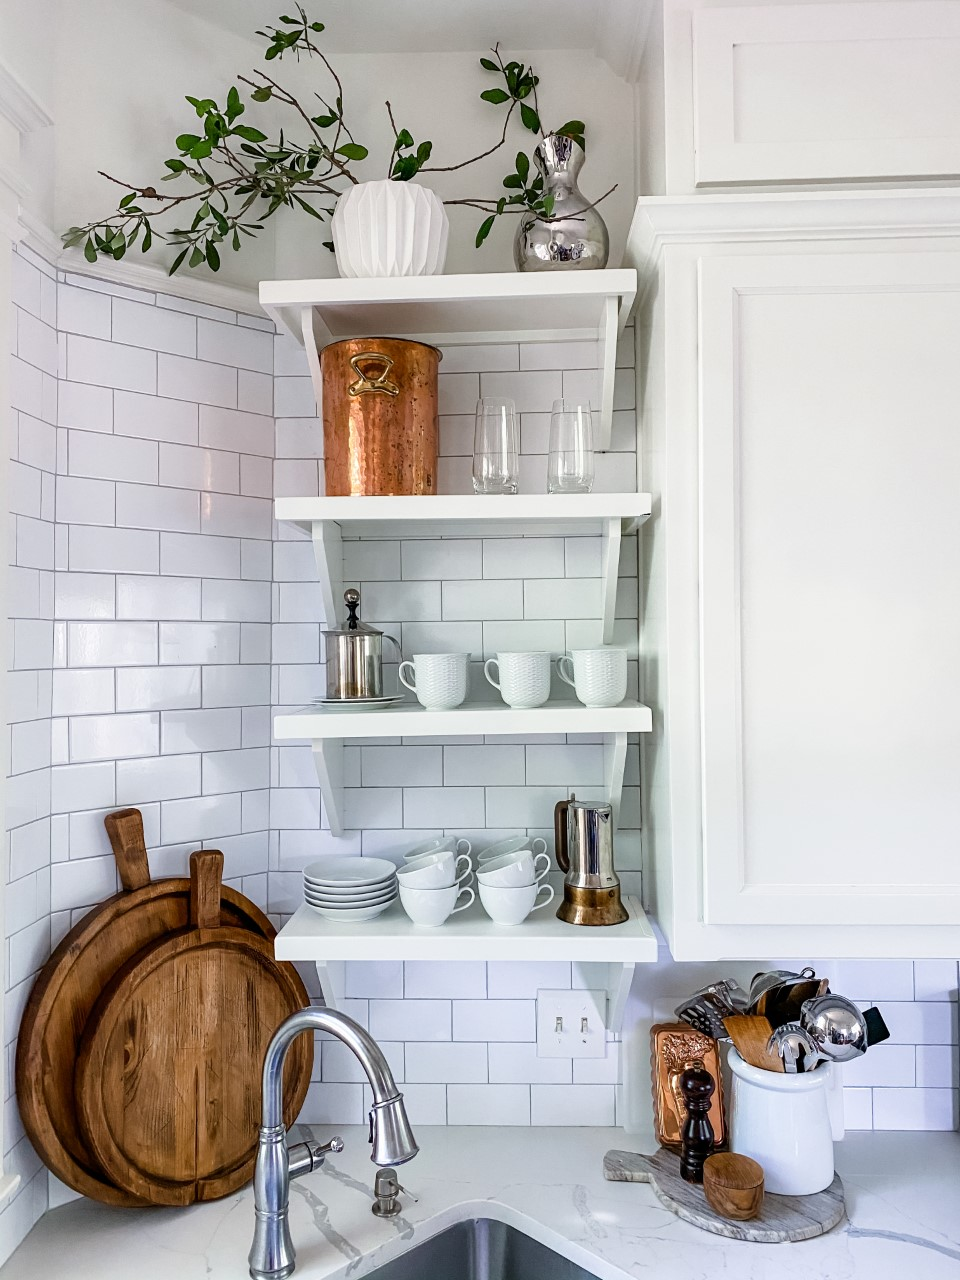 Organizing Kitchen Ideas